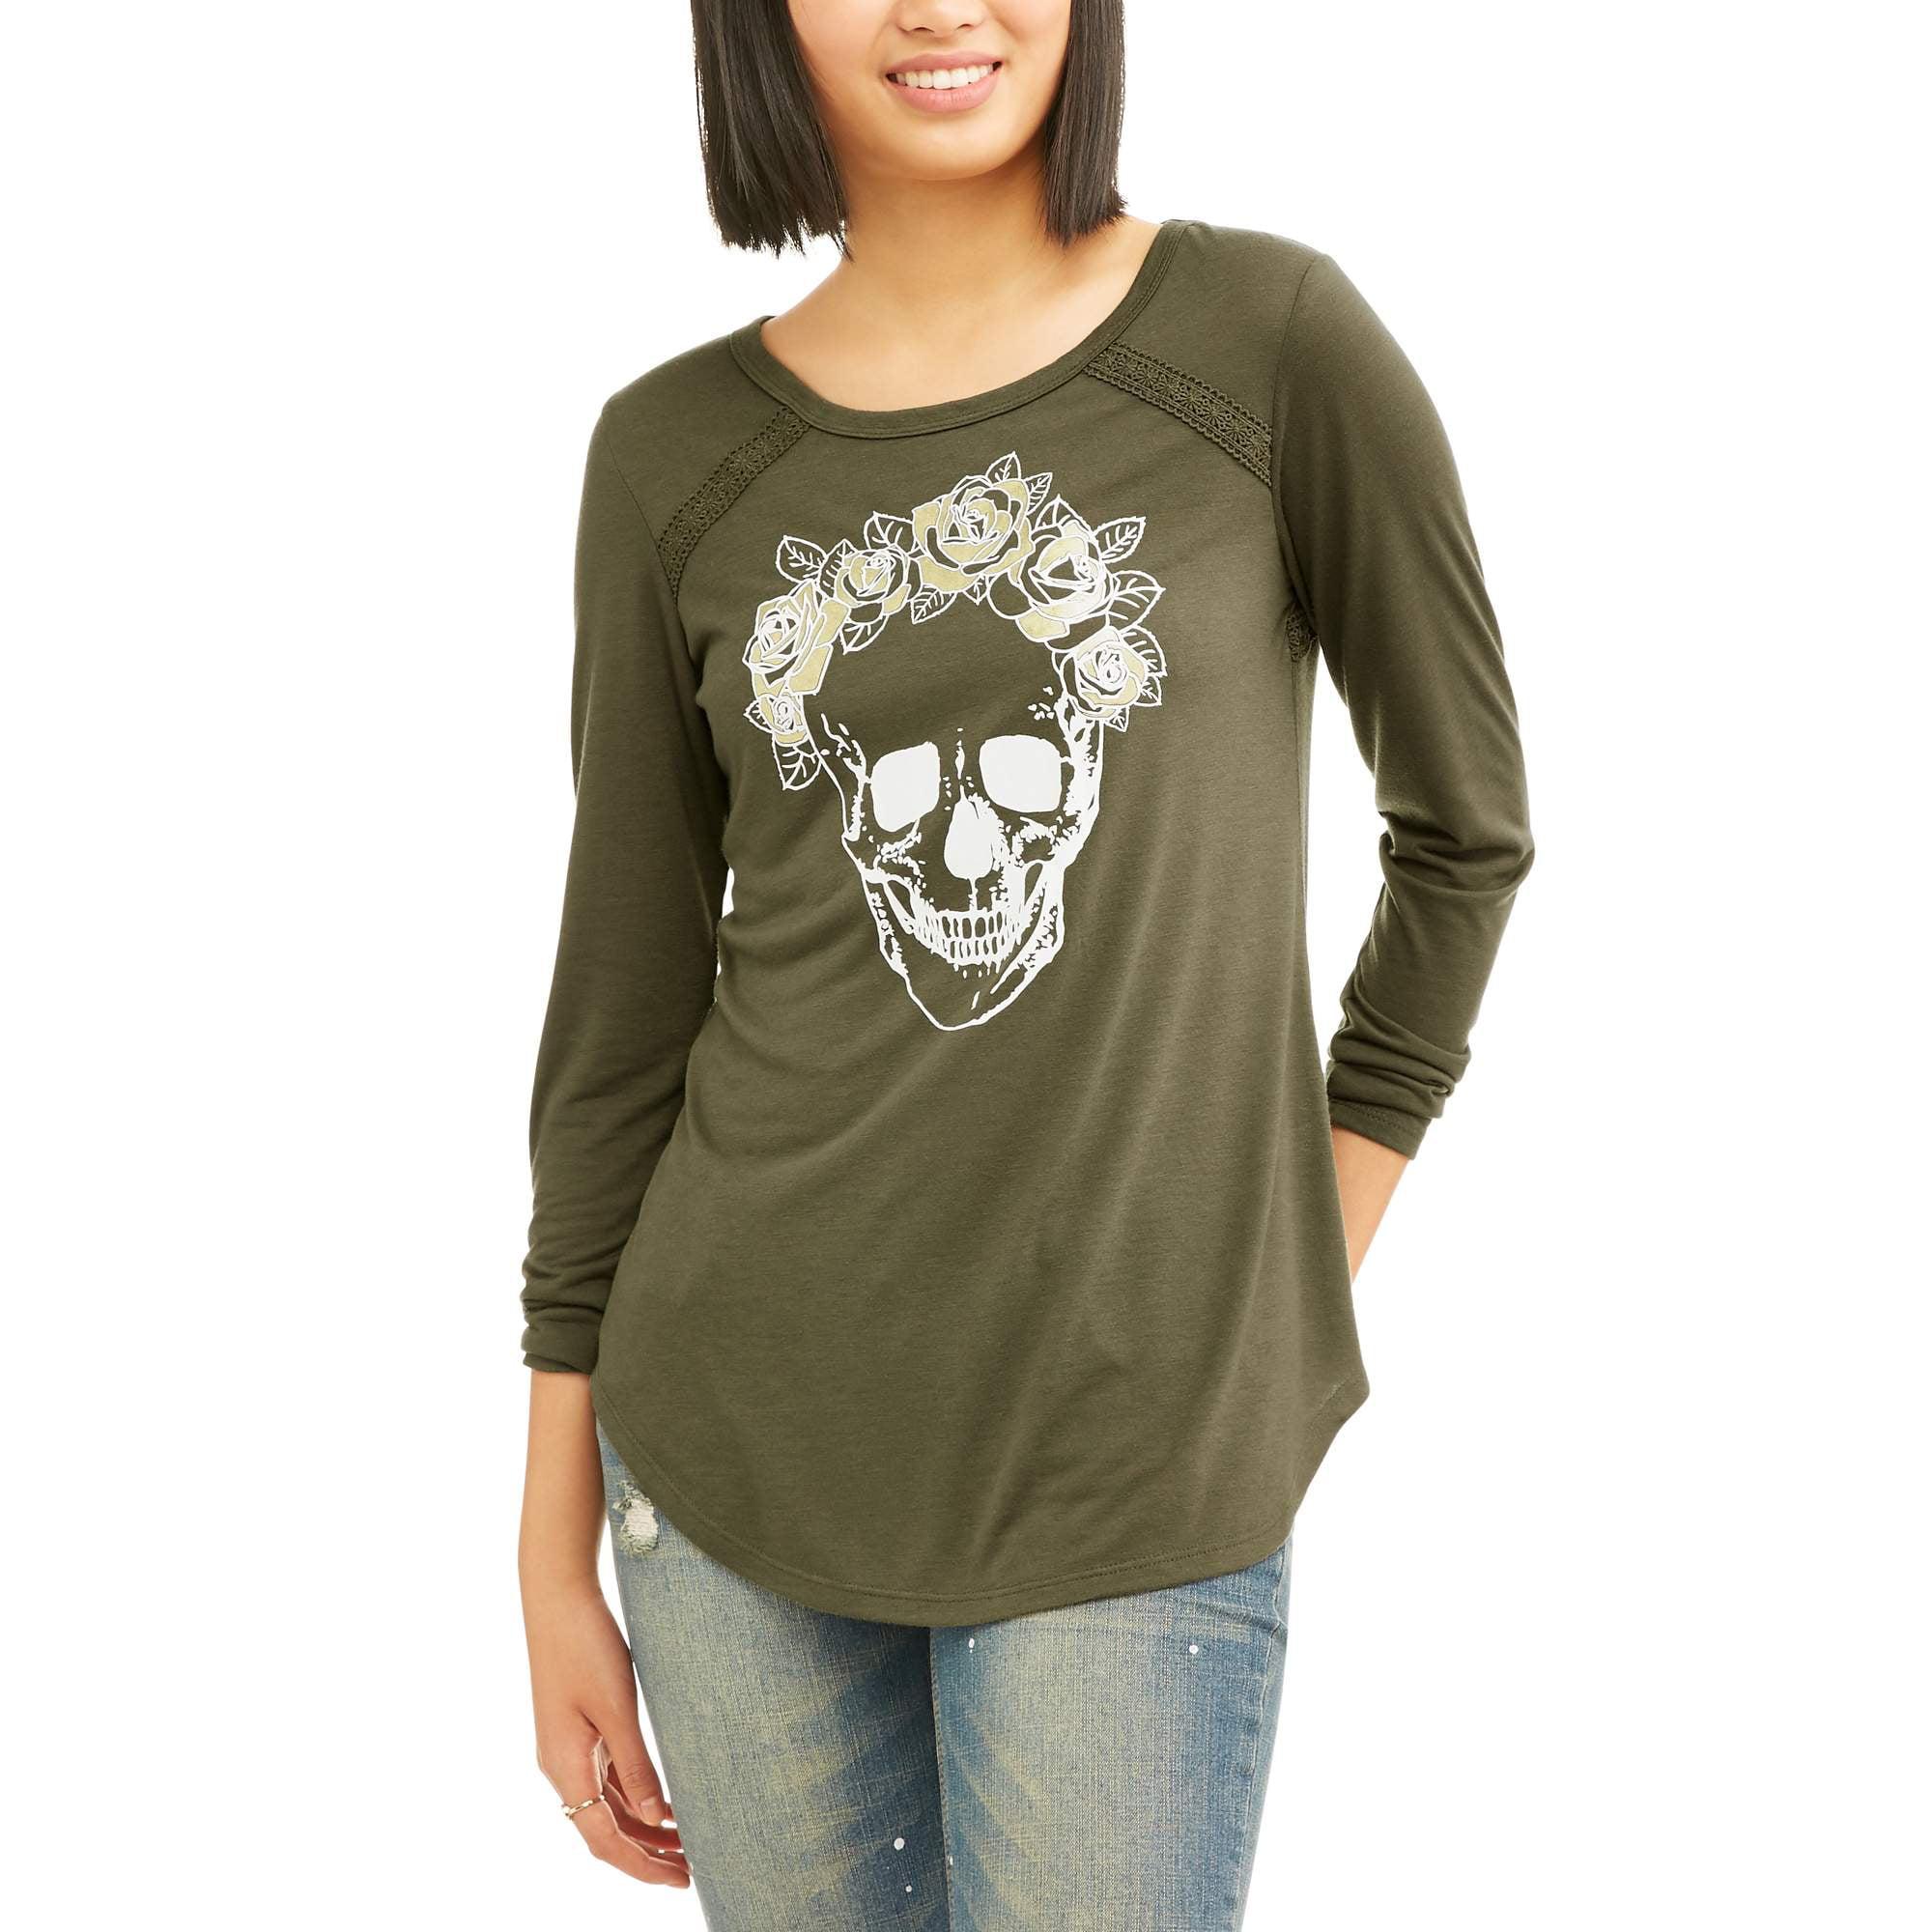 a8c0fa6a Juniors' Cut-Out Back Graphic Long Sleeve T-Shirt – Walmart ...